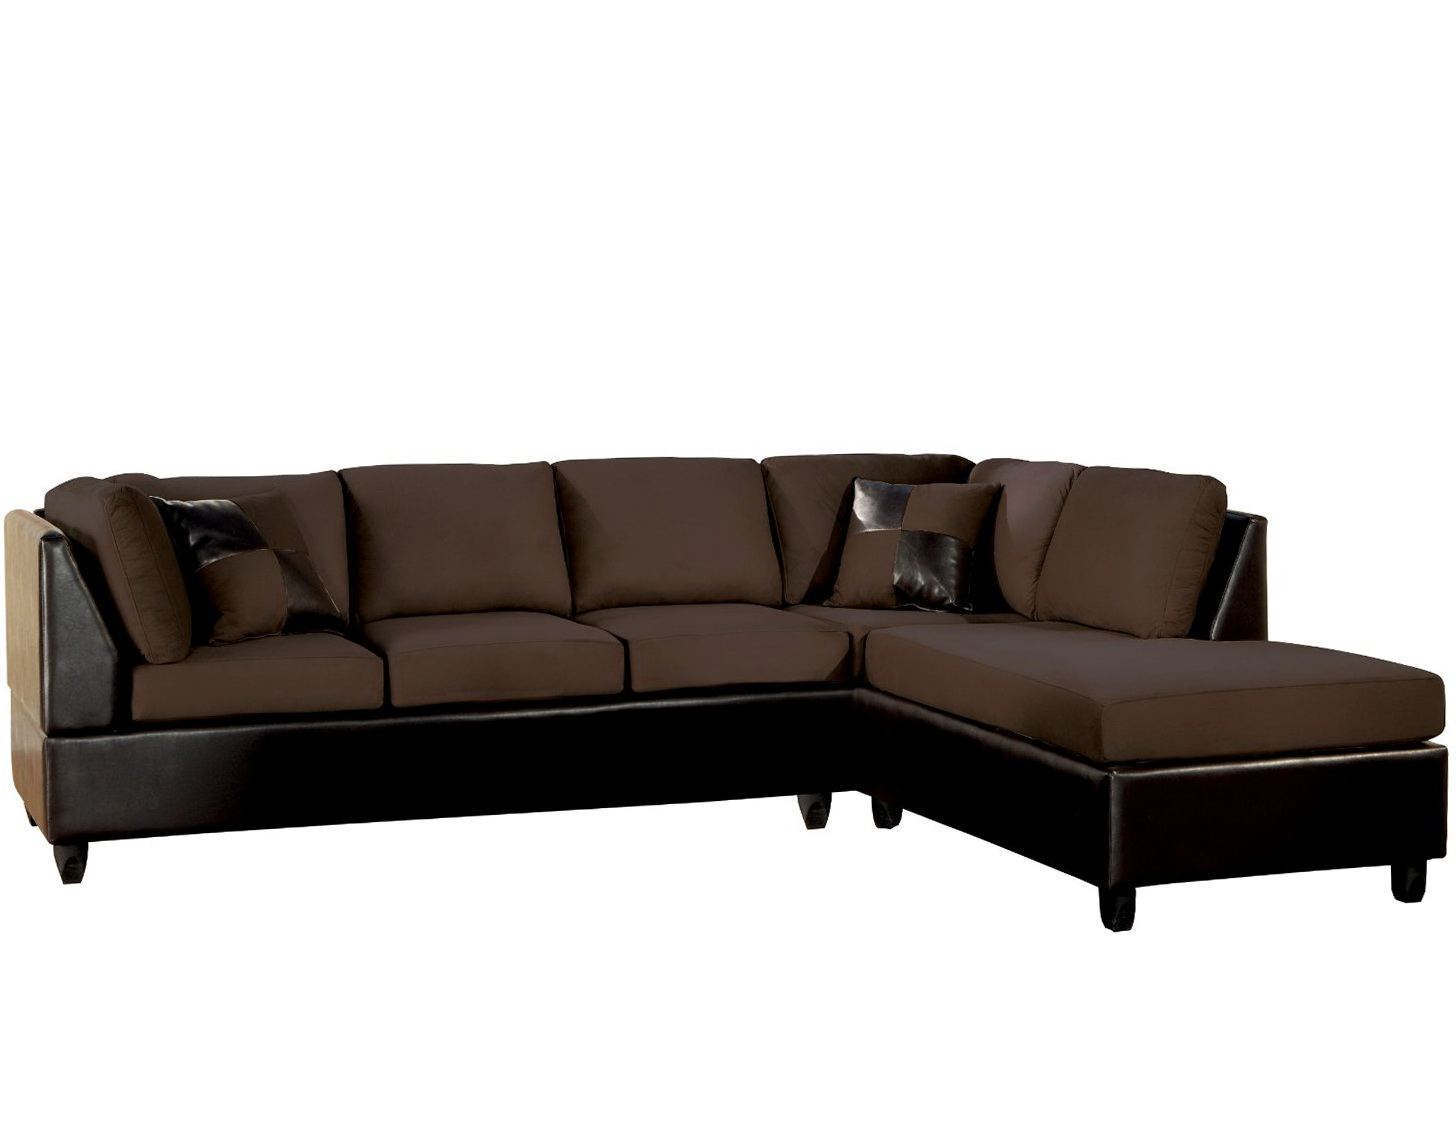 Best Sectional Sofa Sleeper